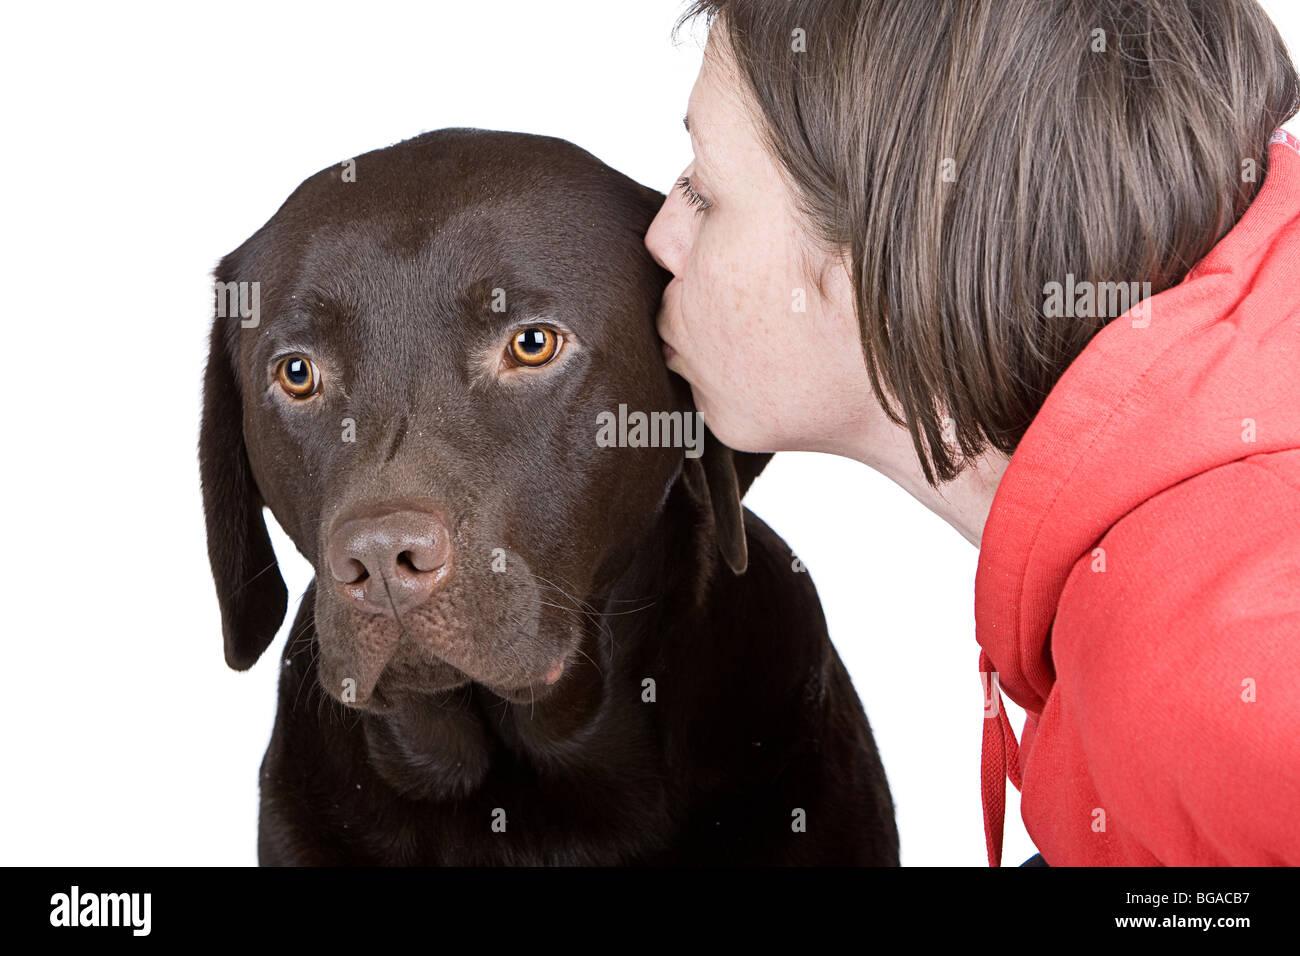 Disparo de un 30S Hembra besando a su mascota Labrador Chocolate Foto de stock